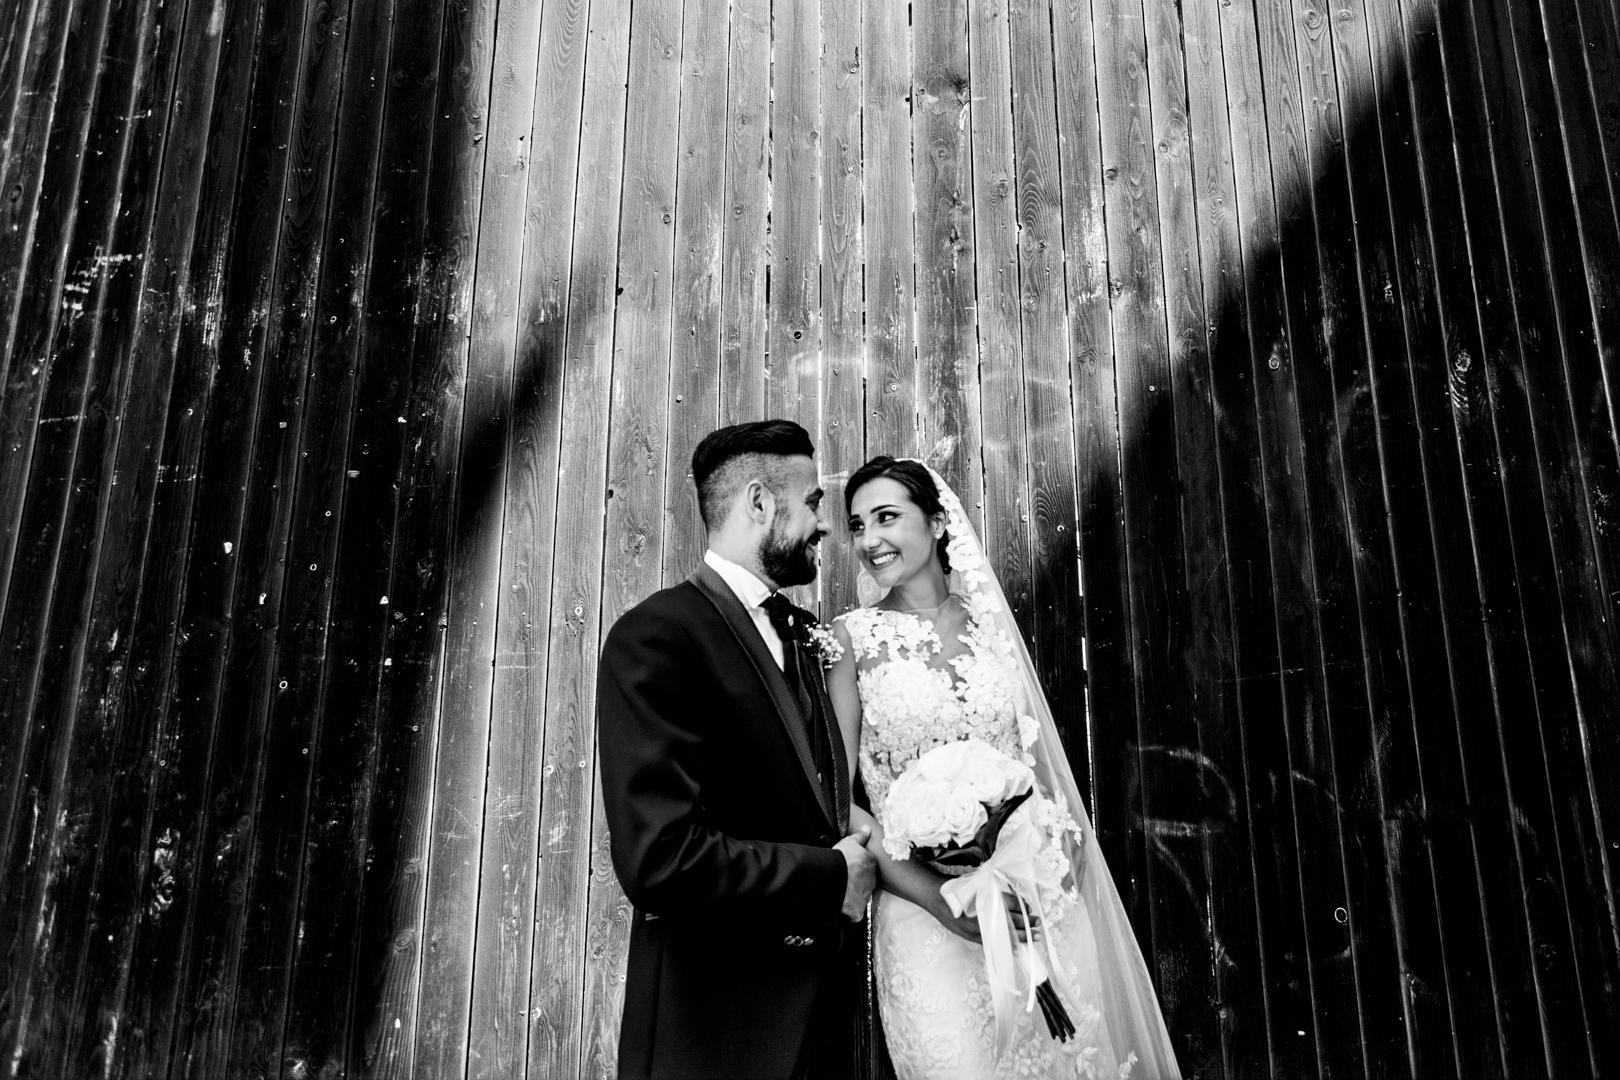 40 gianni-lepore-matrimonio-lucera-shooting-groom-bride-sposi-piazza-duomo